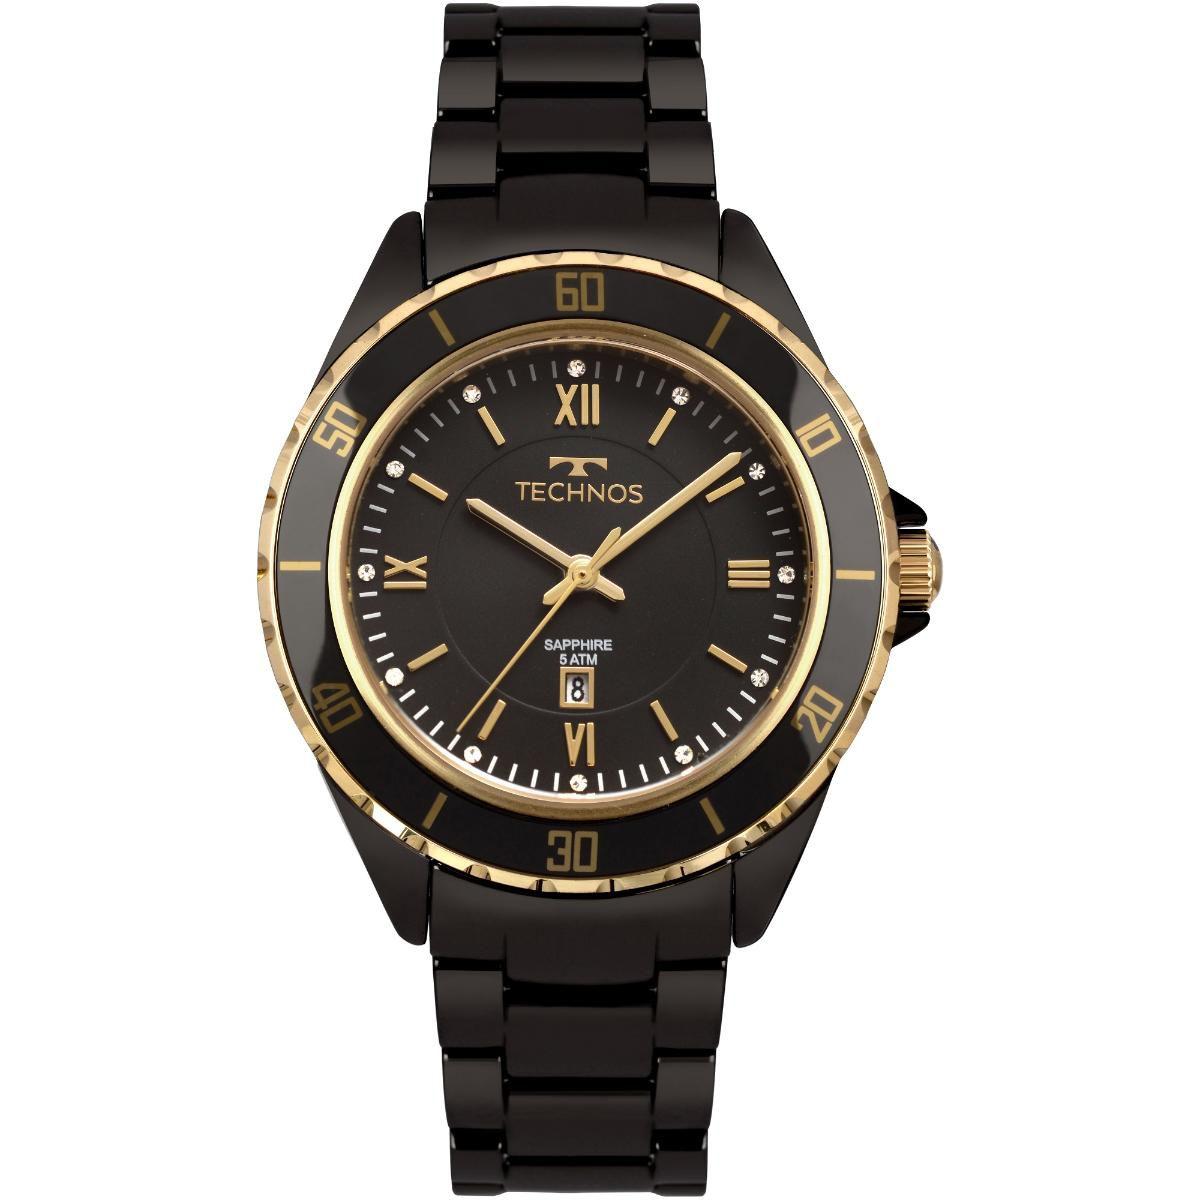 Relógio Feminino Technos 2015CAO 4P 38mm Cerâmica Preta - Vitrino Relógios 5d6cf67622